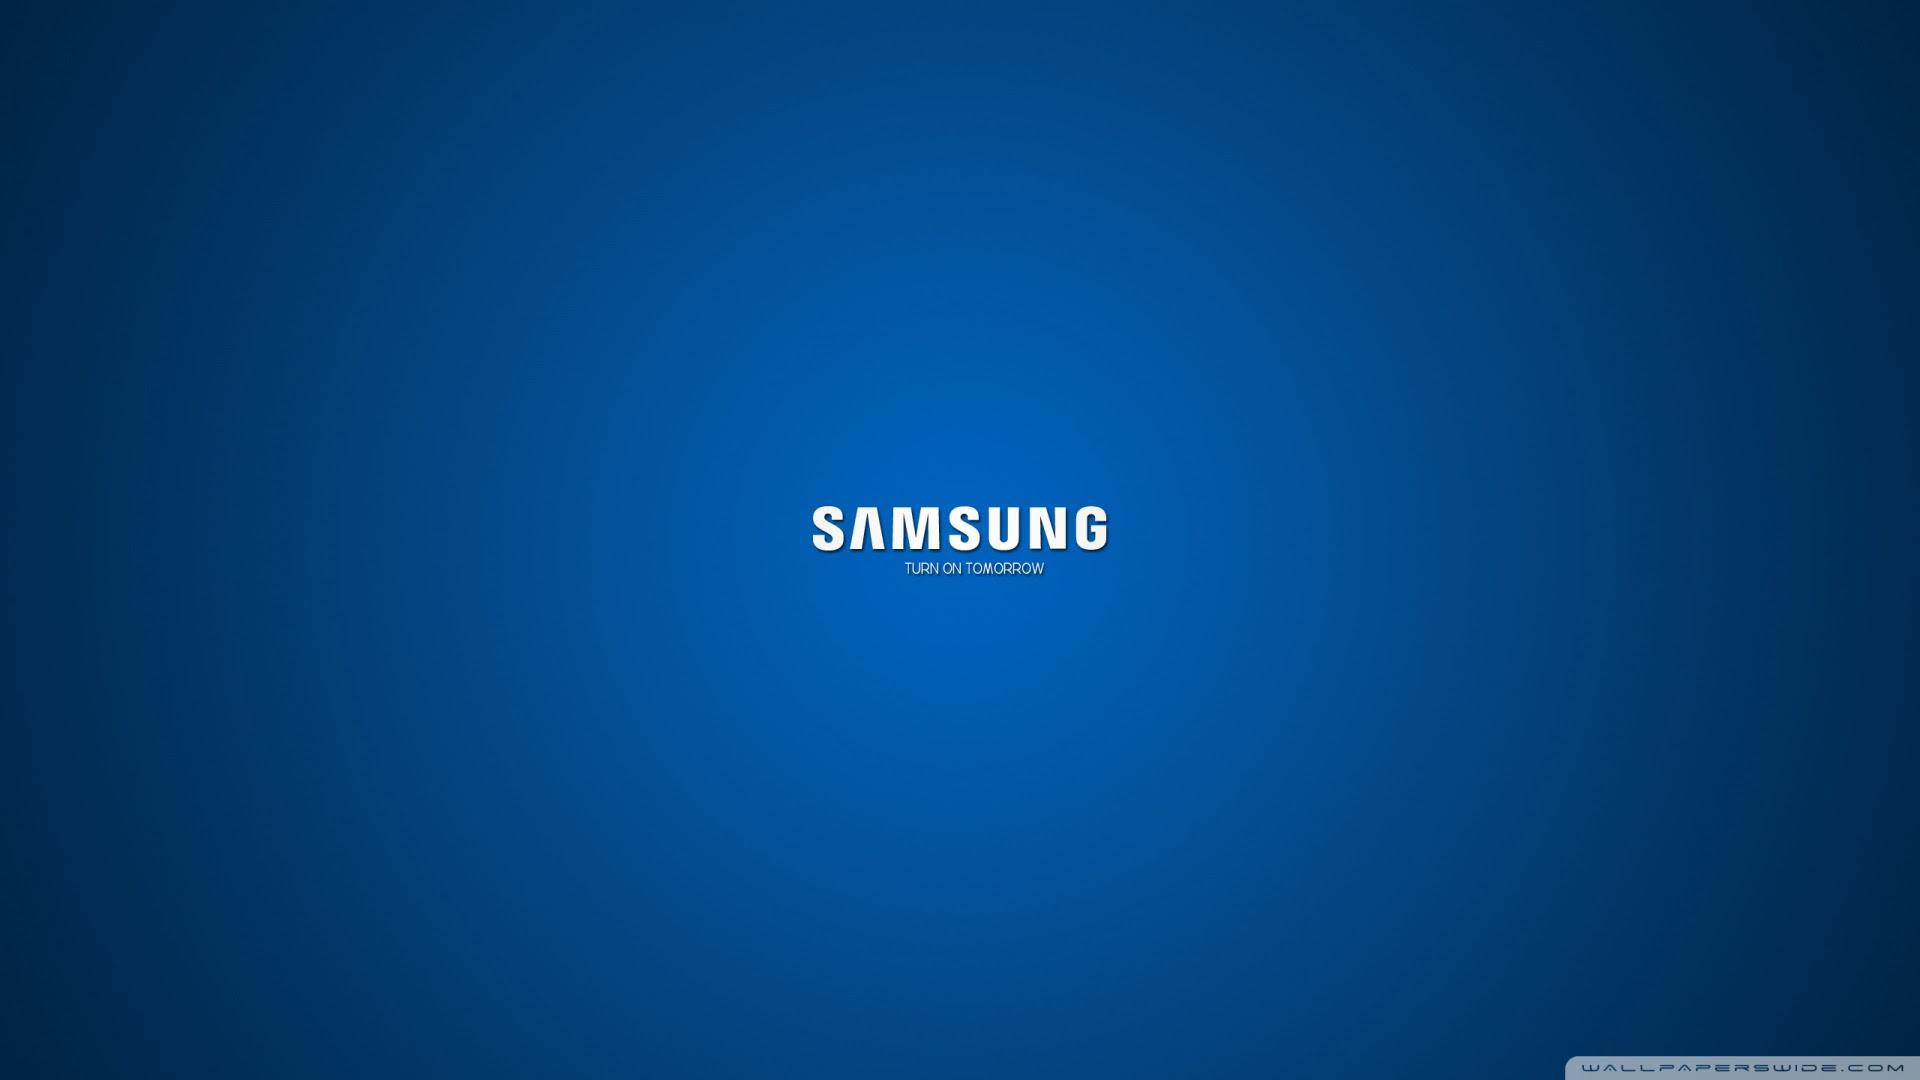 Wallpaper Hd Samsung